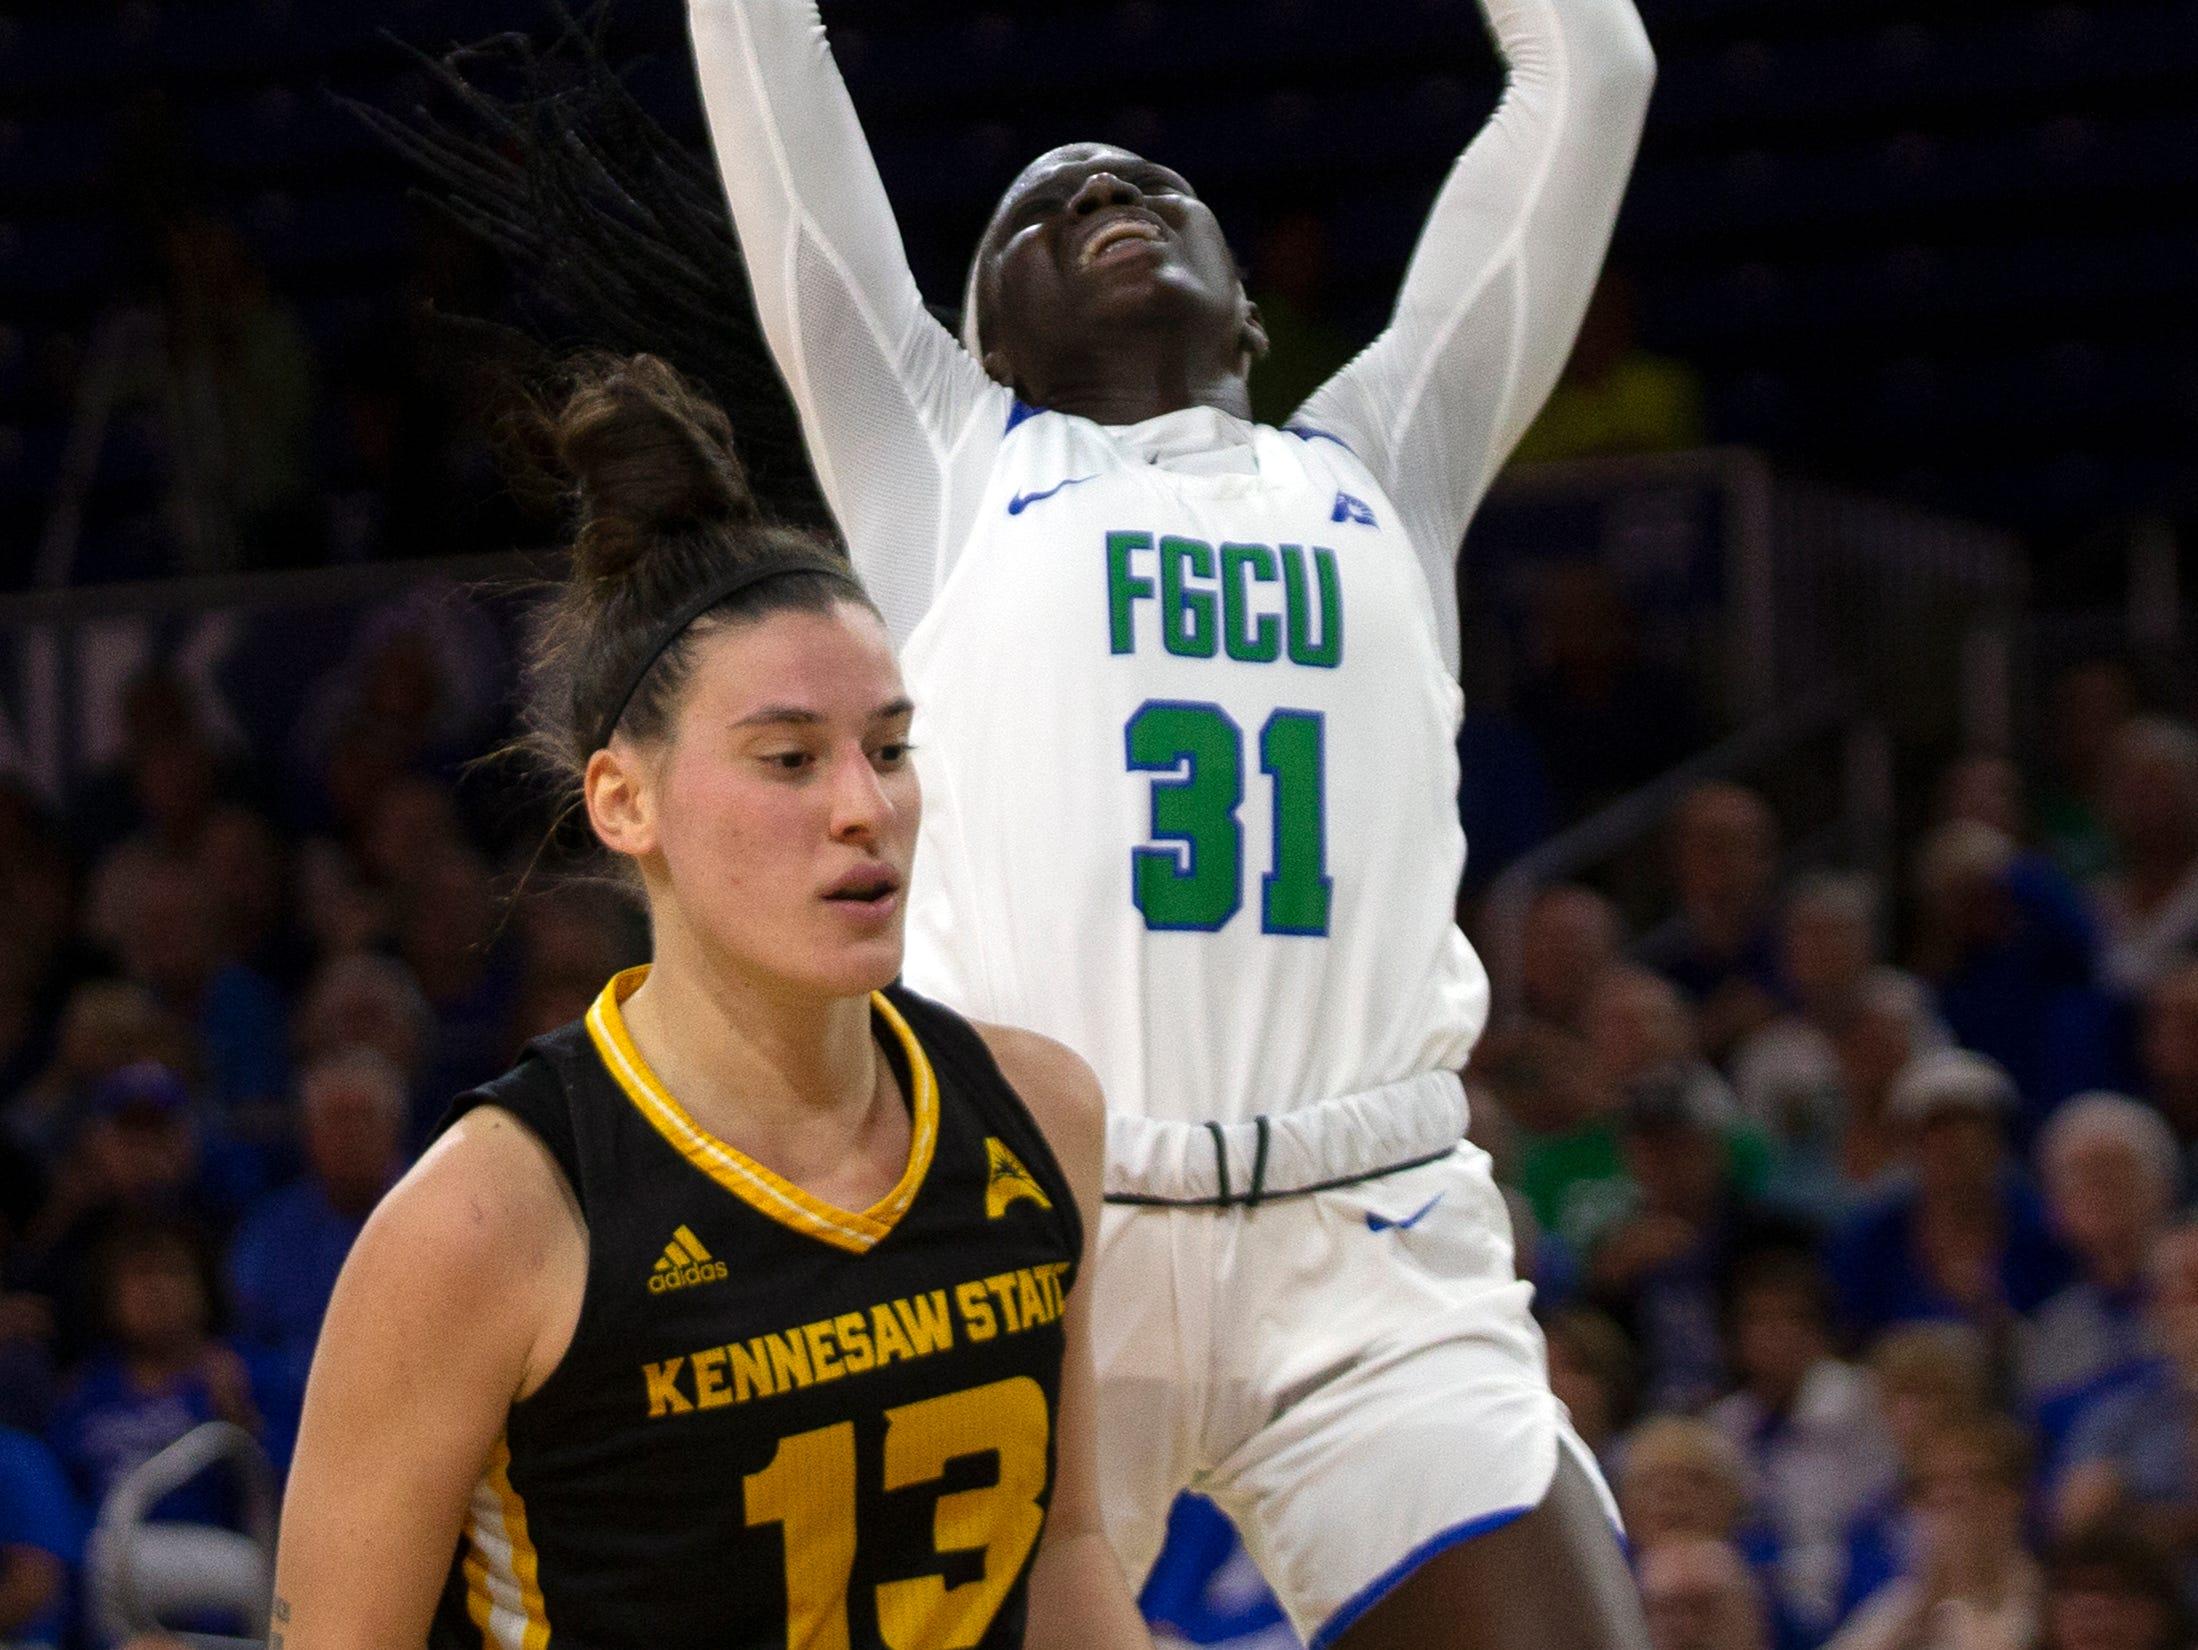 Florida Gulf Coast University's Nasrin Ulel goes for a layup against Kennesaw State, Wednesday, March 13, 2019, at Florida Gulf Coast University's Alico Arena.